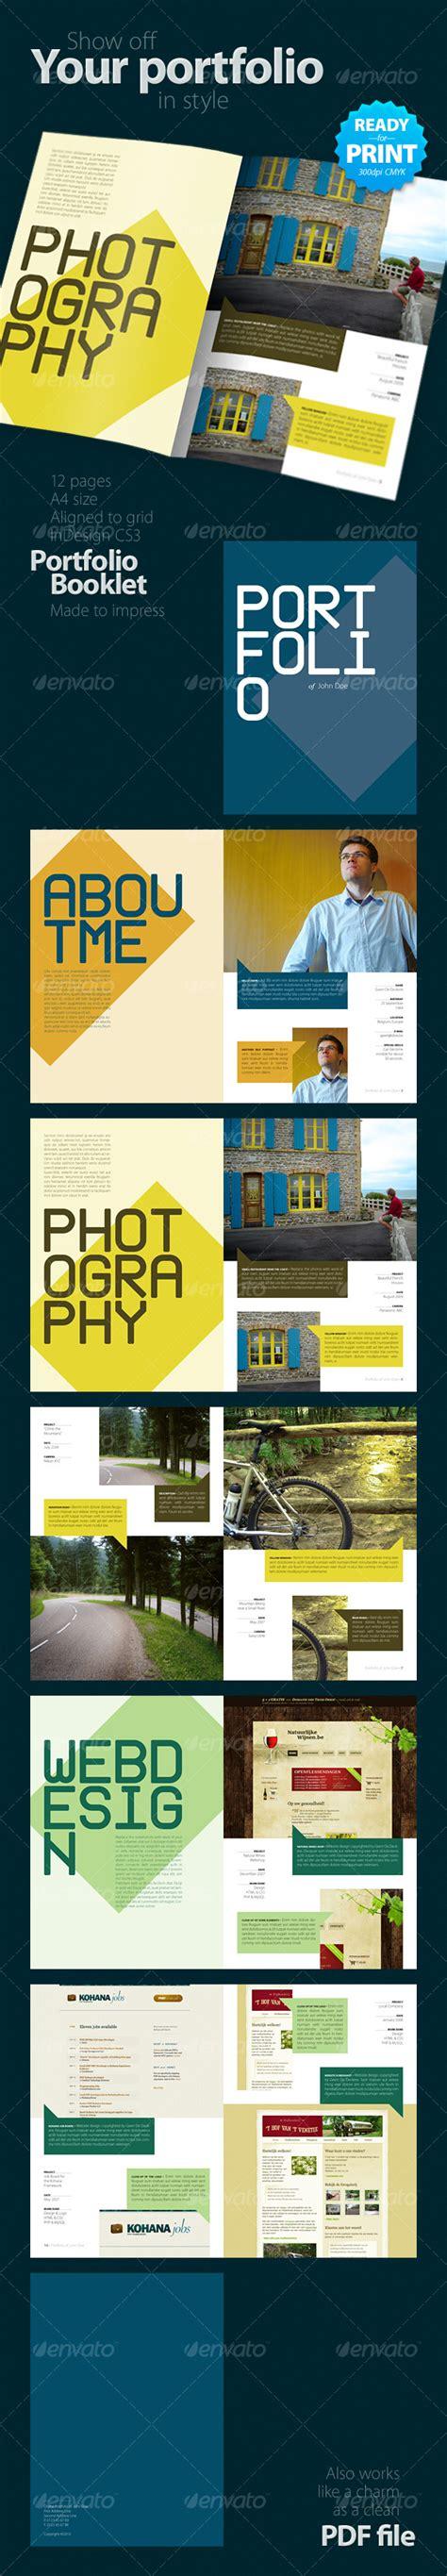 booklet layout design sles portfolio booklet 12 pages brochures design and for sale